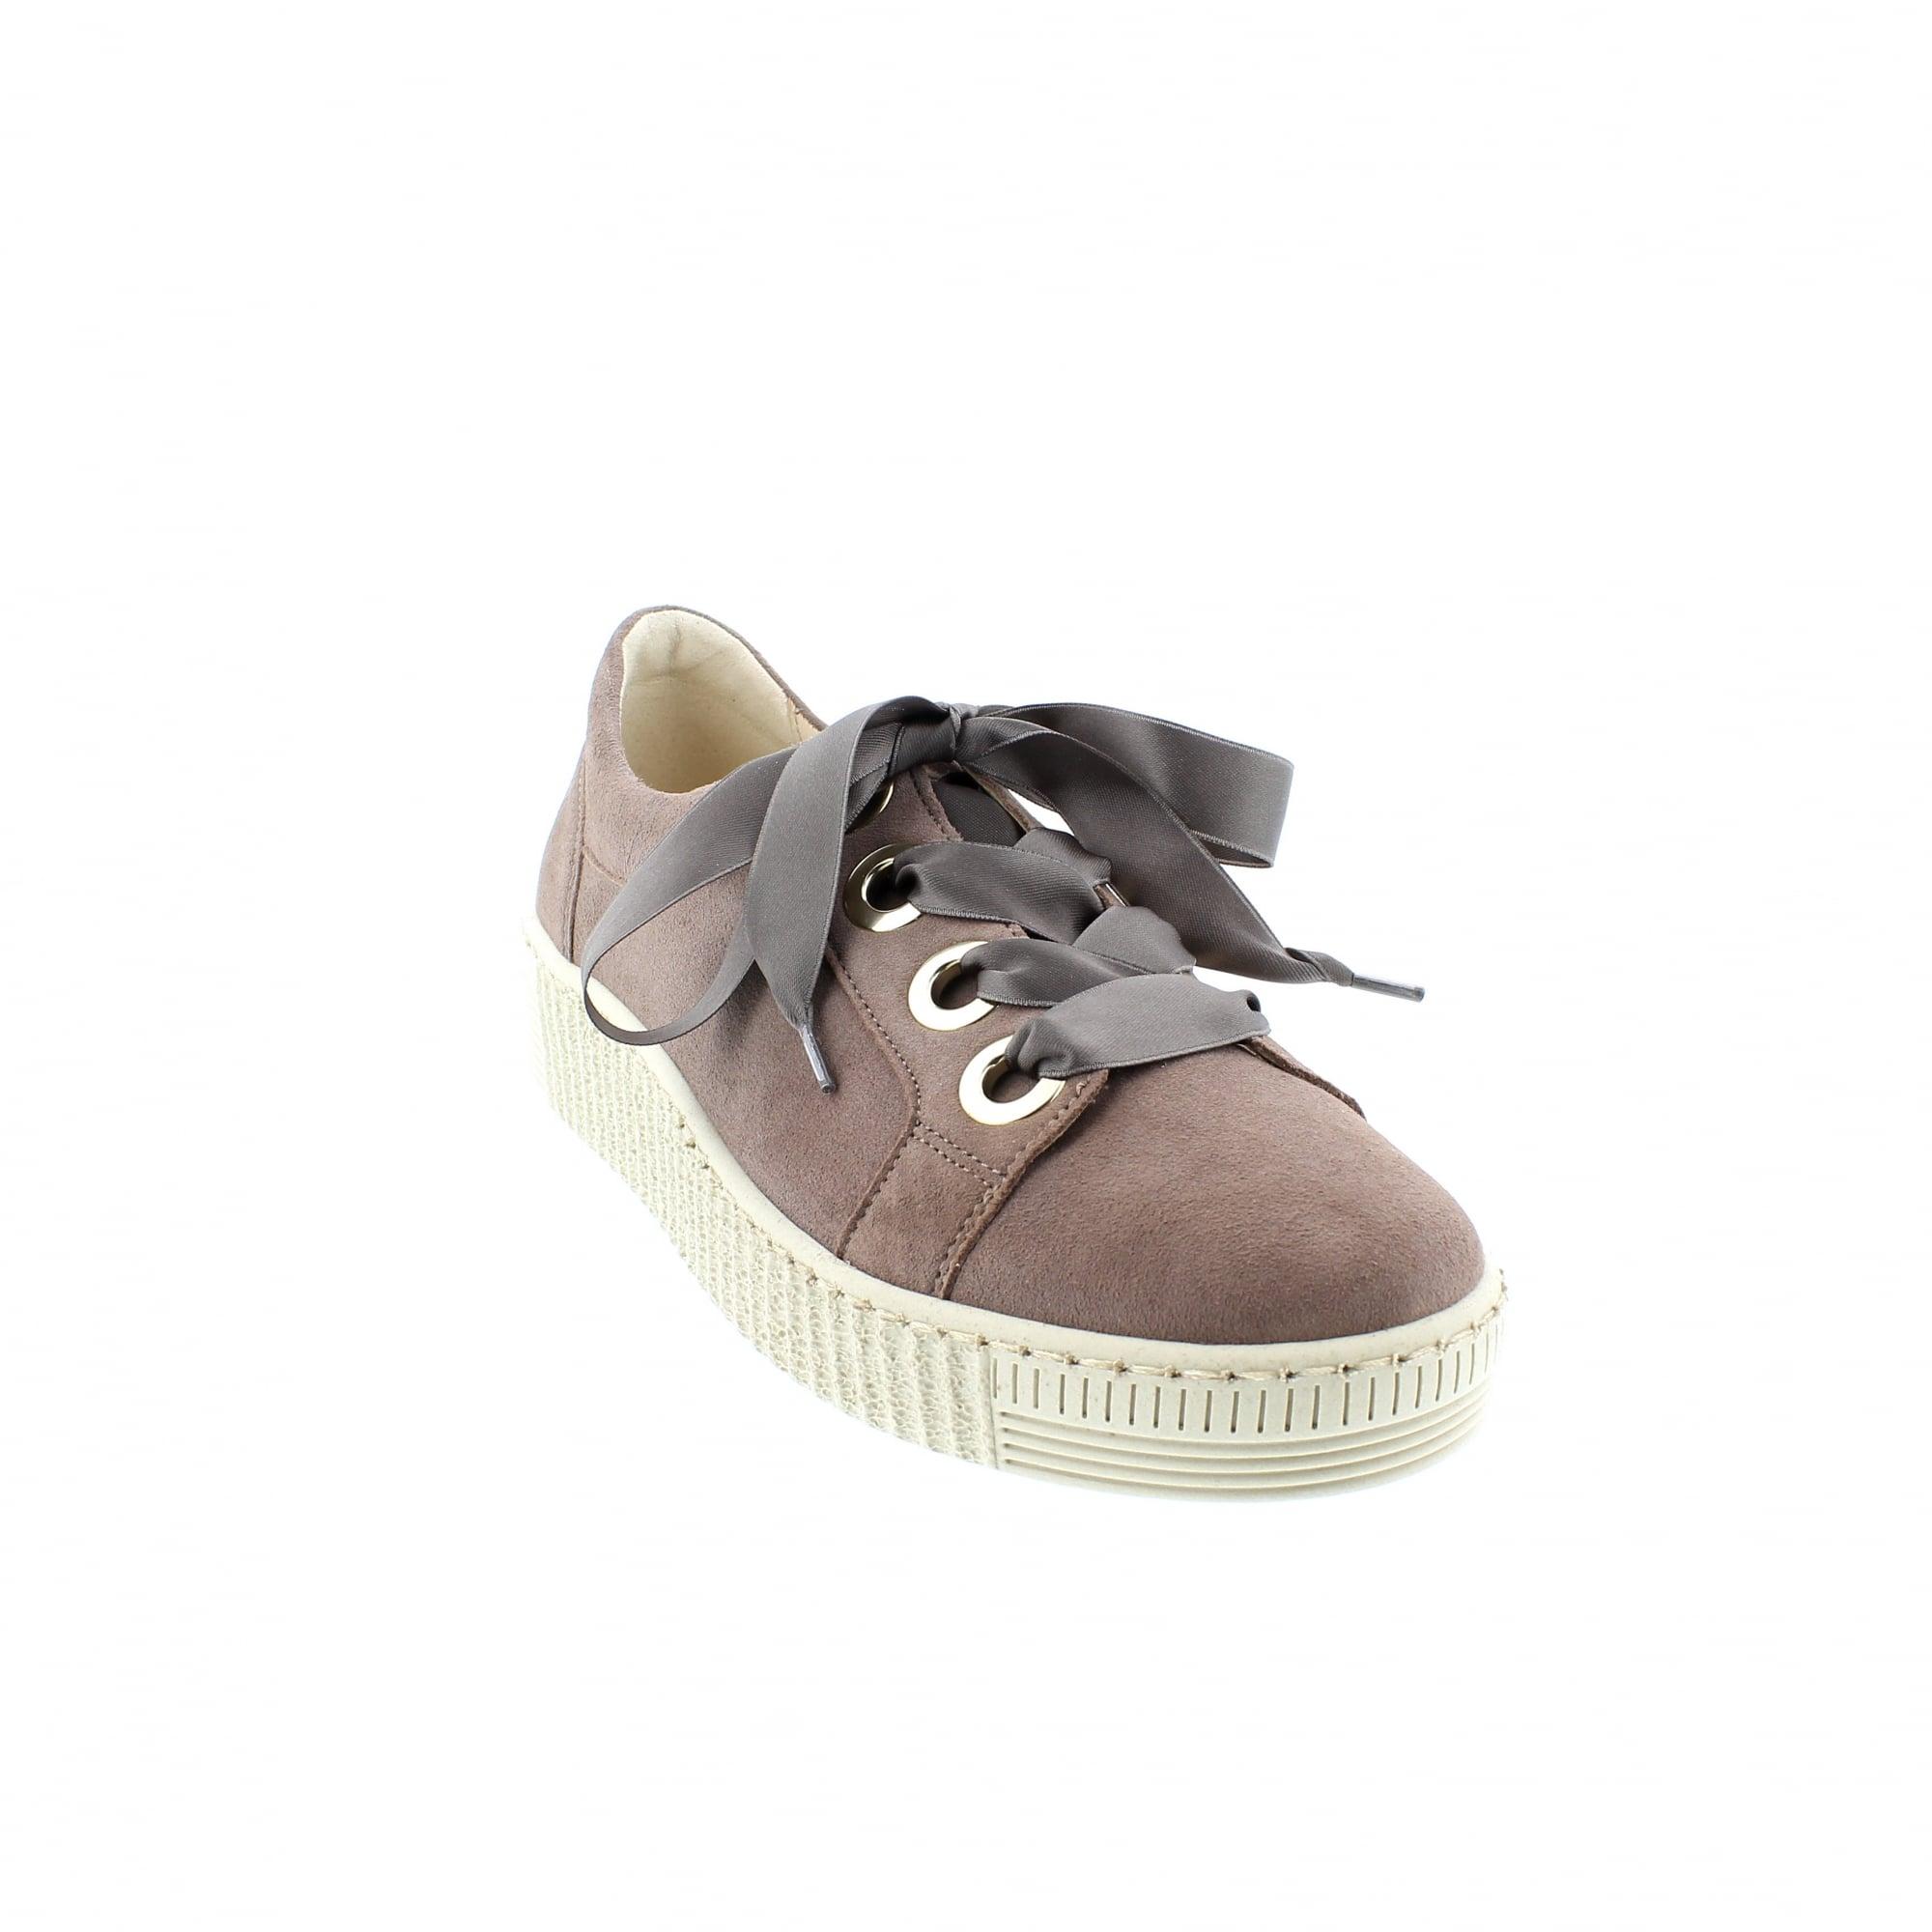 Gabor WIDE FIT Trainers dust Plain Sports Shoes Woen's Suede